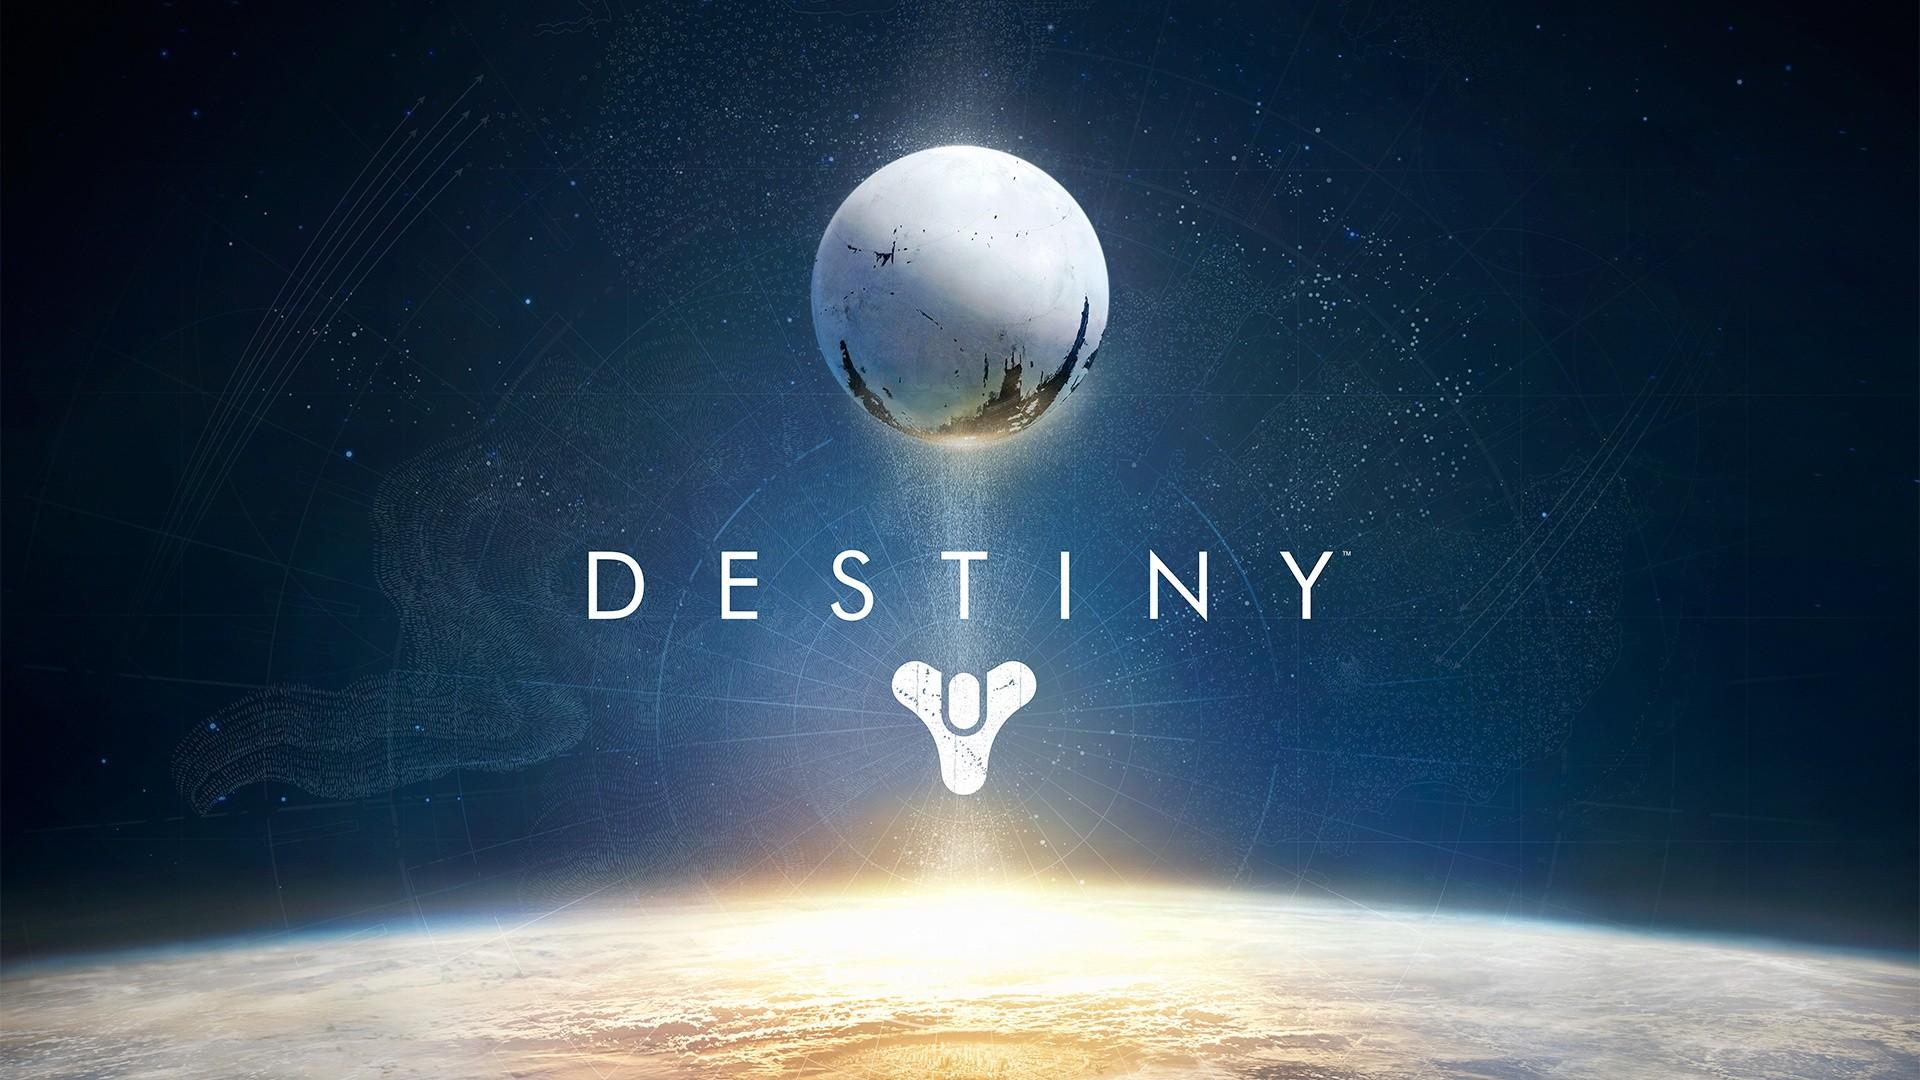 destiny-logo-wallpapers_36550_1920x1080.jpg